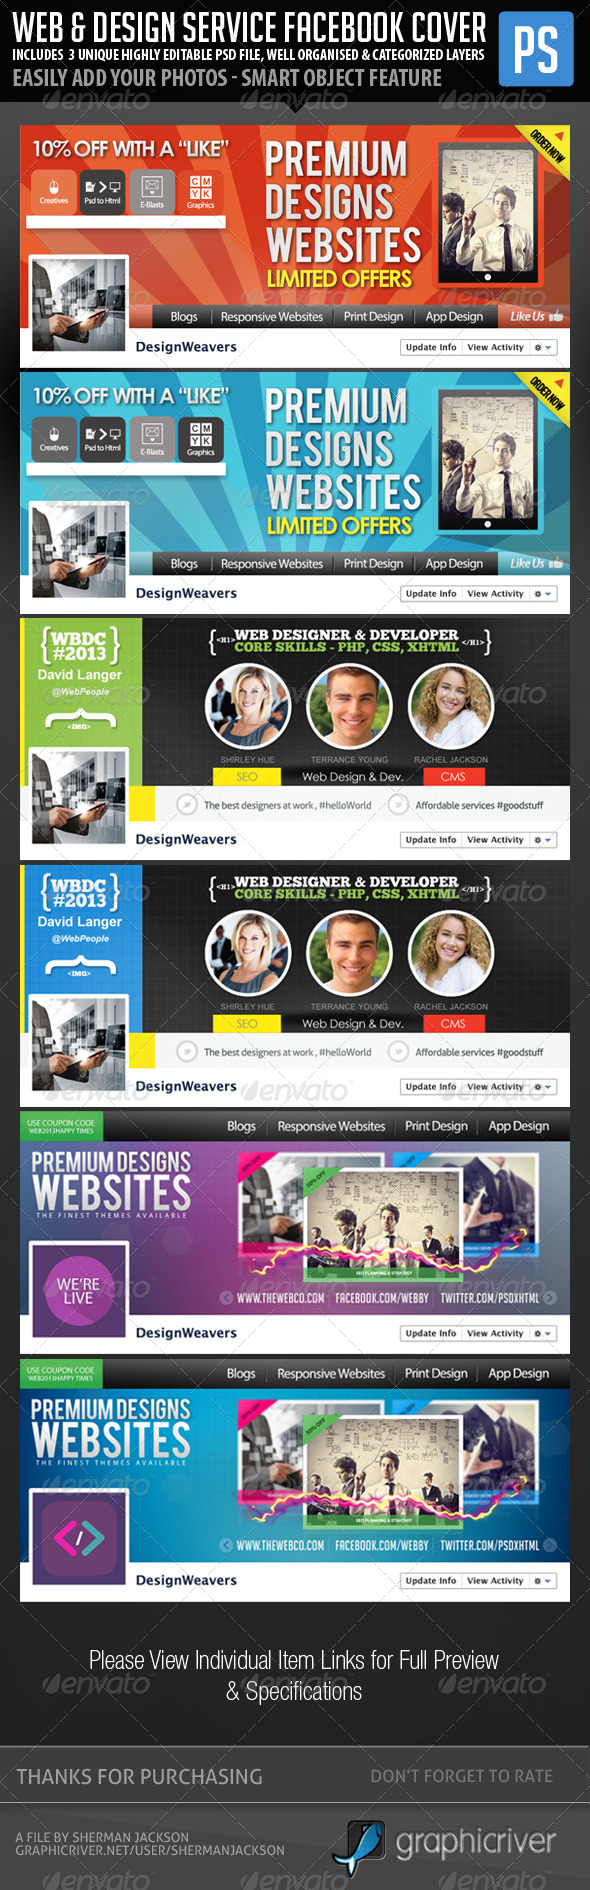 Web U0026 Graphic Design Service Facebook Bundle   Facebook Timeline Covers  Social Media